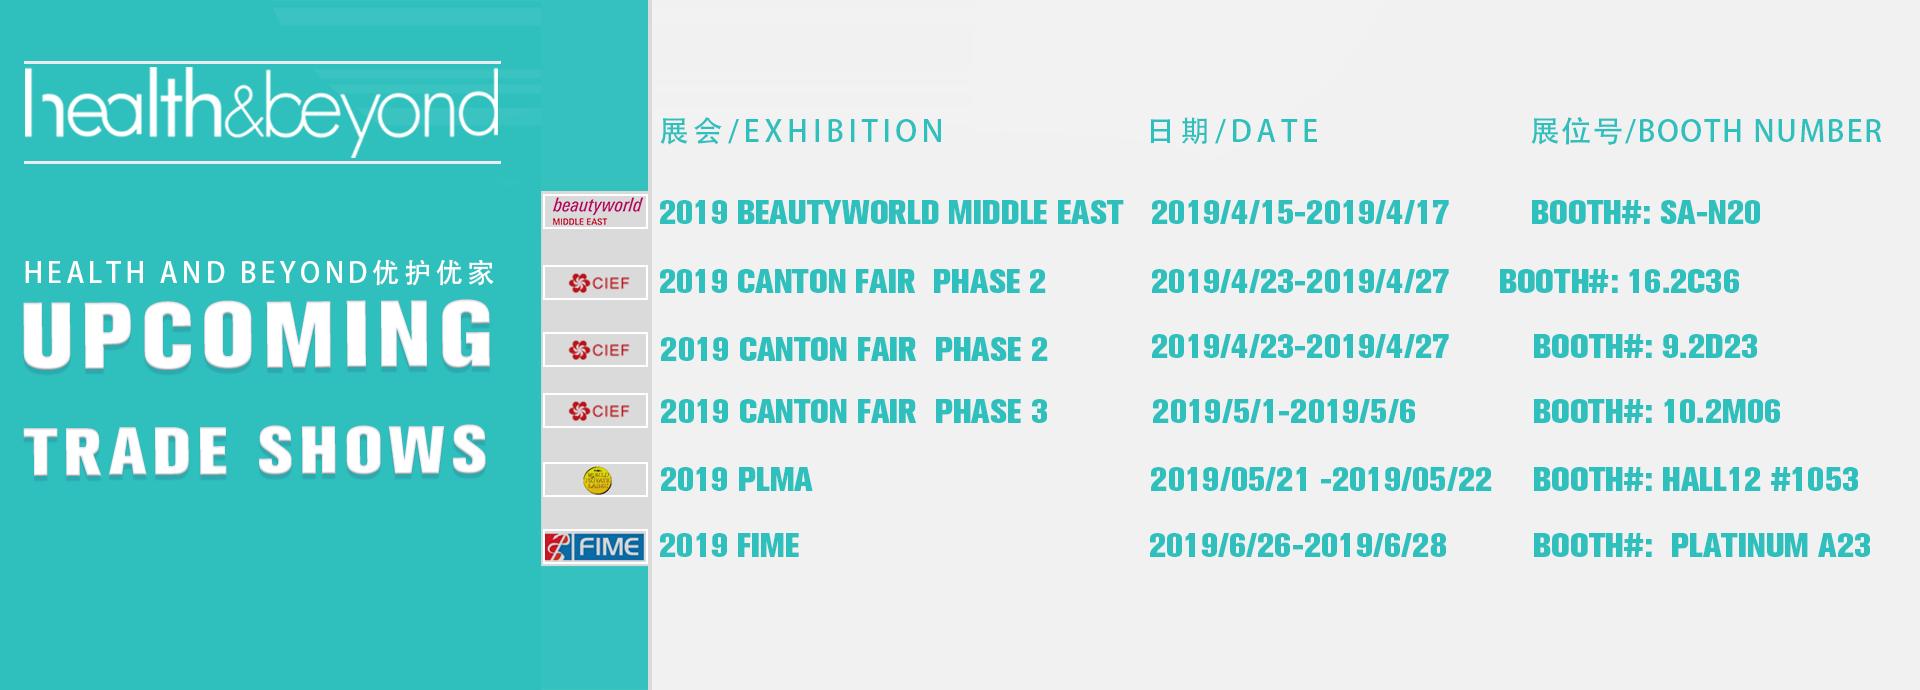 2019 exhibition information